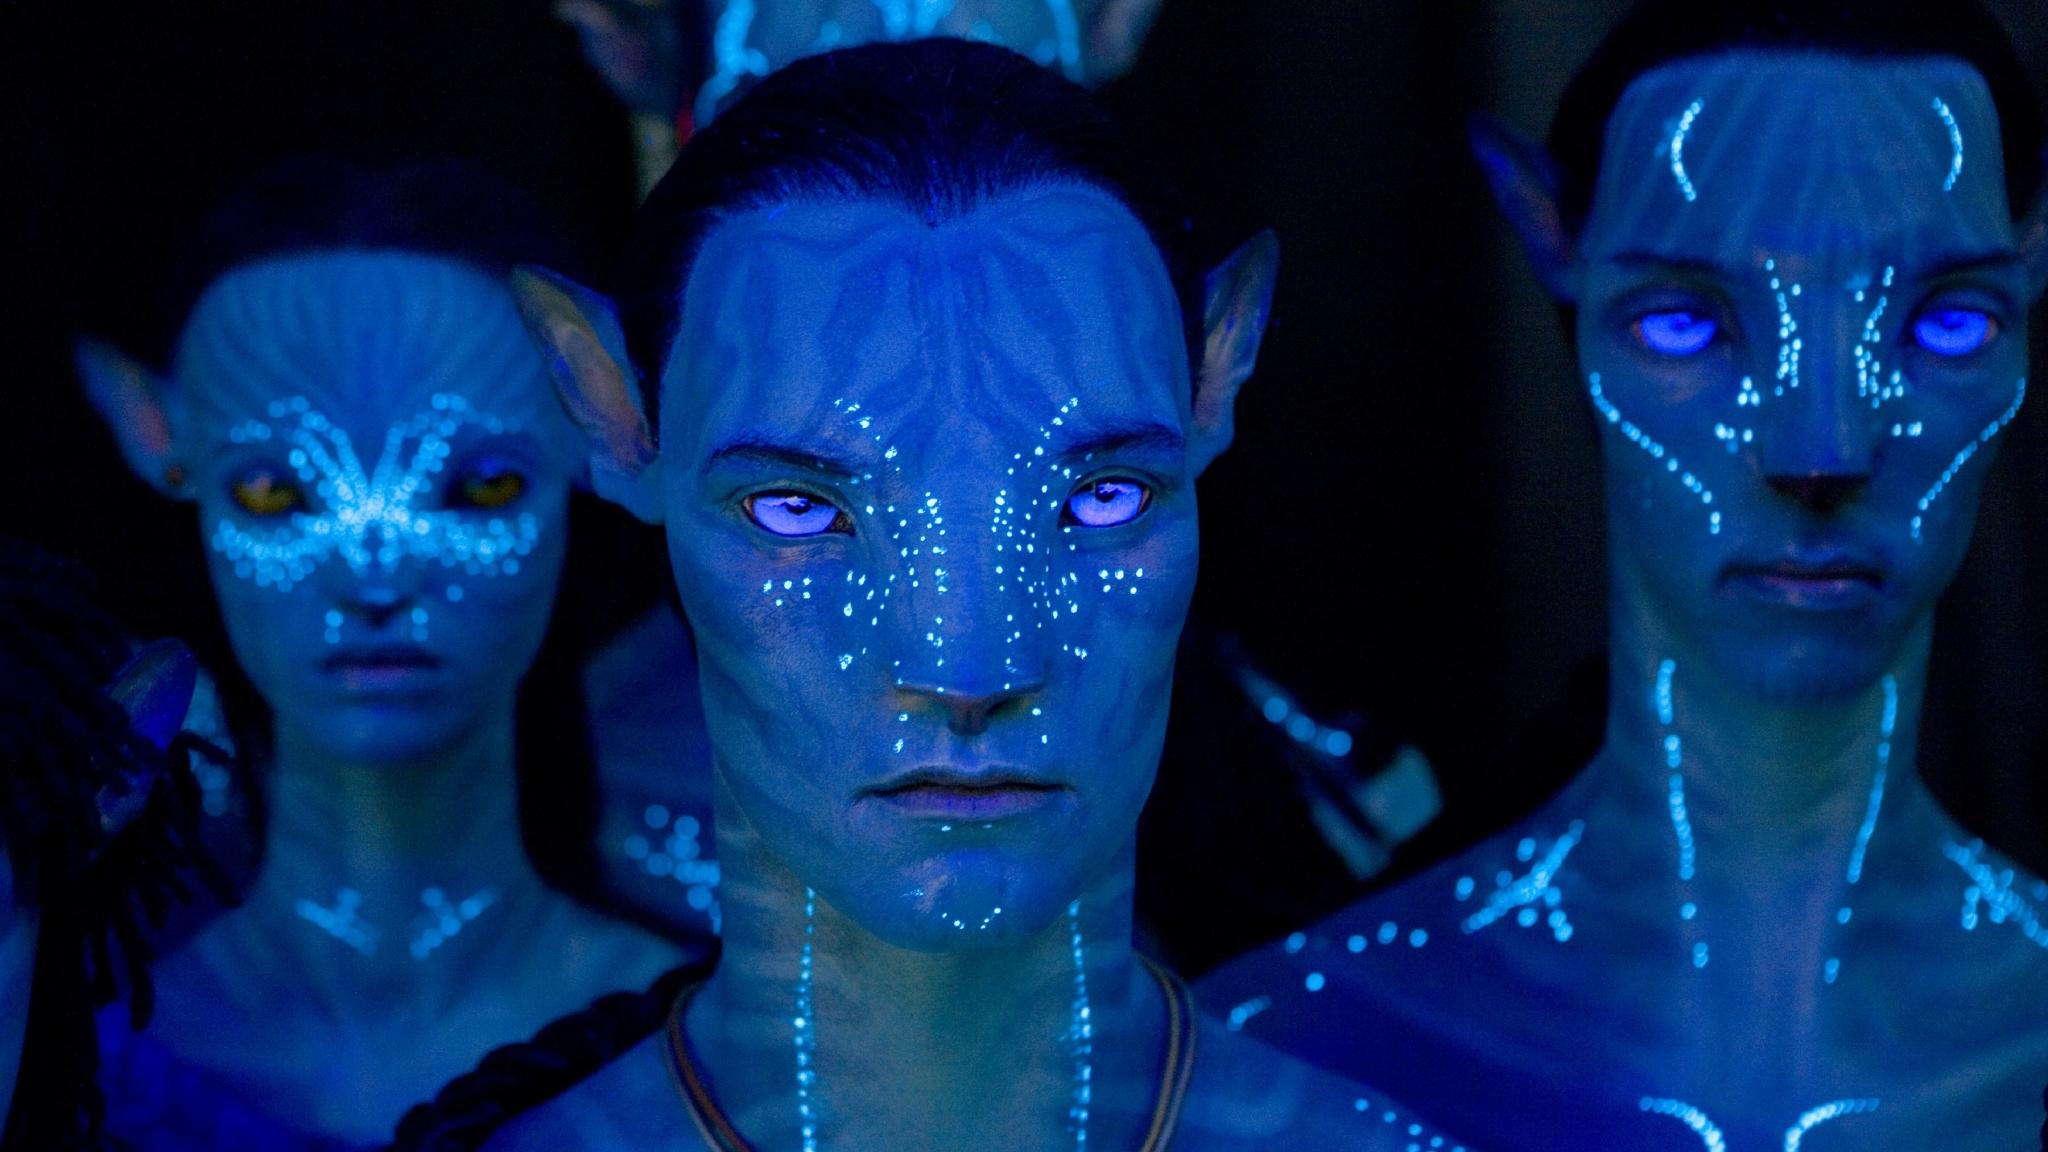 2048x1152 Avatar 2 Movie 4k 2048x1152 Resolution Wallpaper